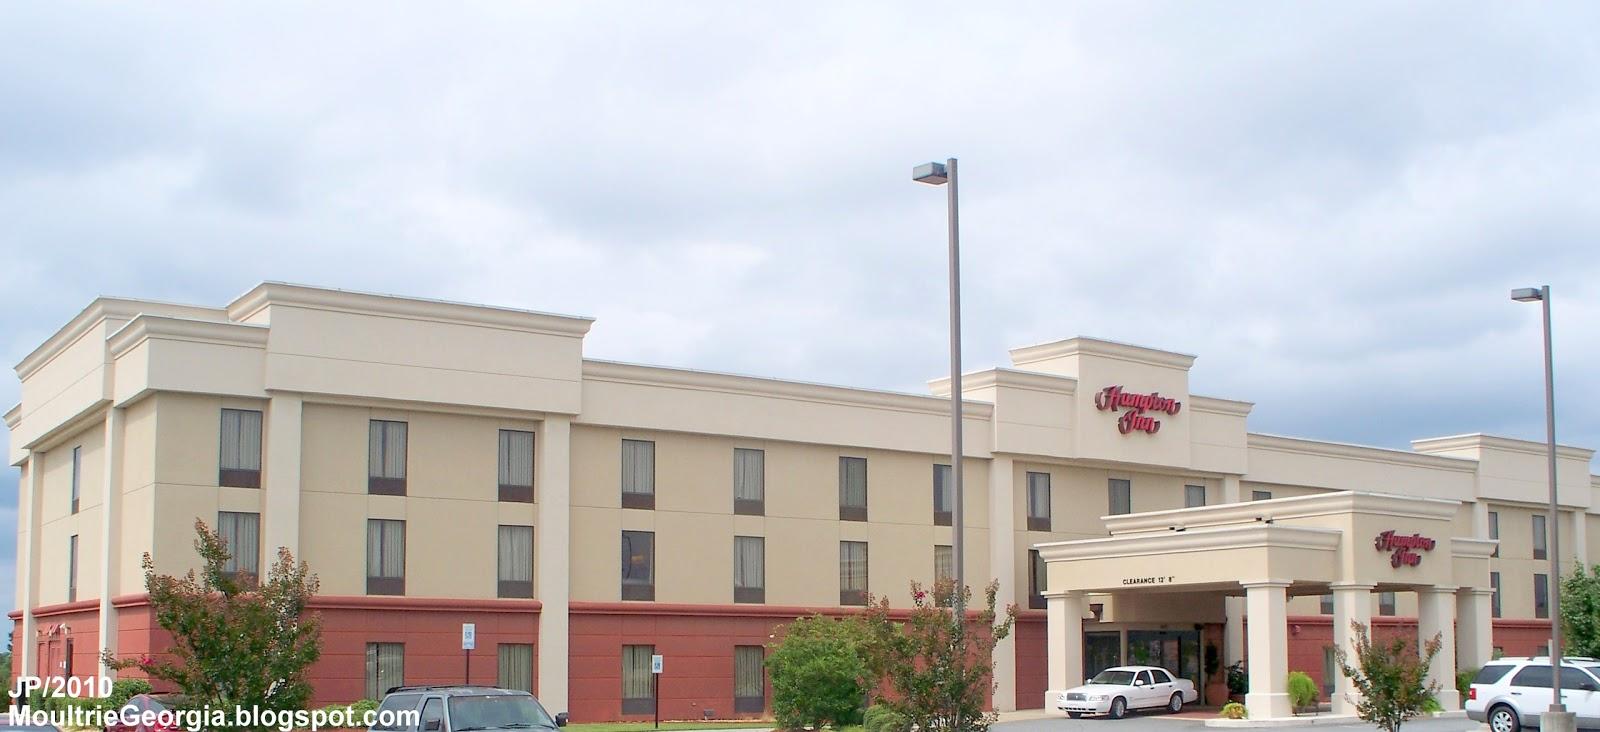 Hampton Inn Hotel Moultrie Georgia Lodging Colquitt County Ga East Byp